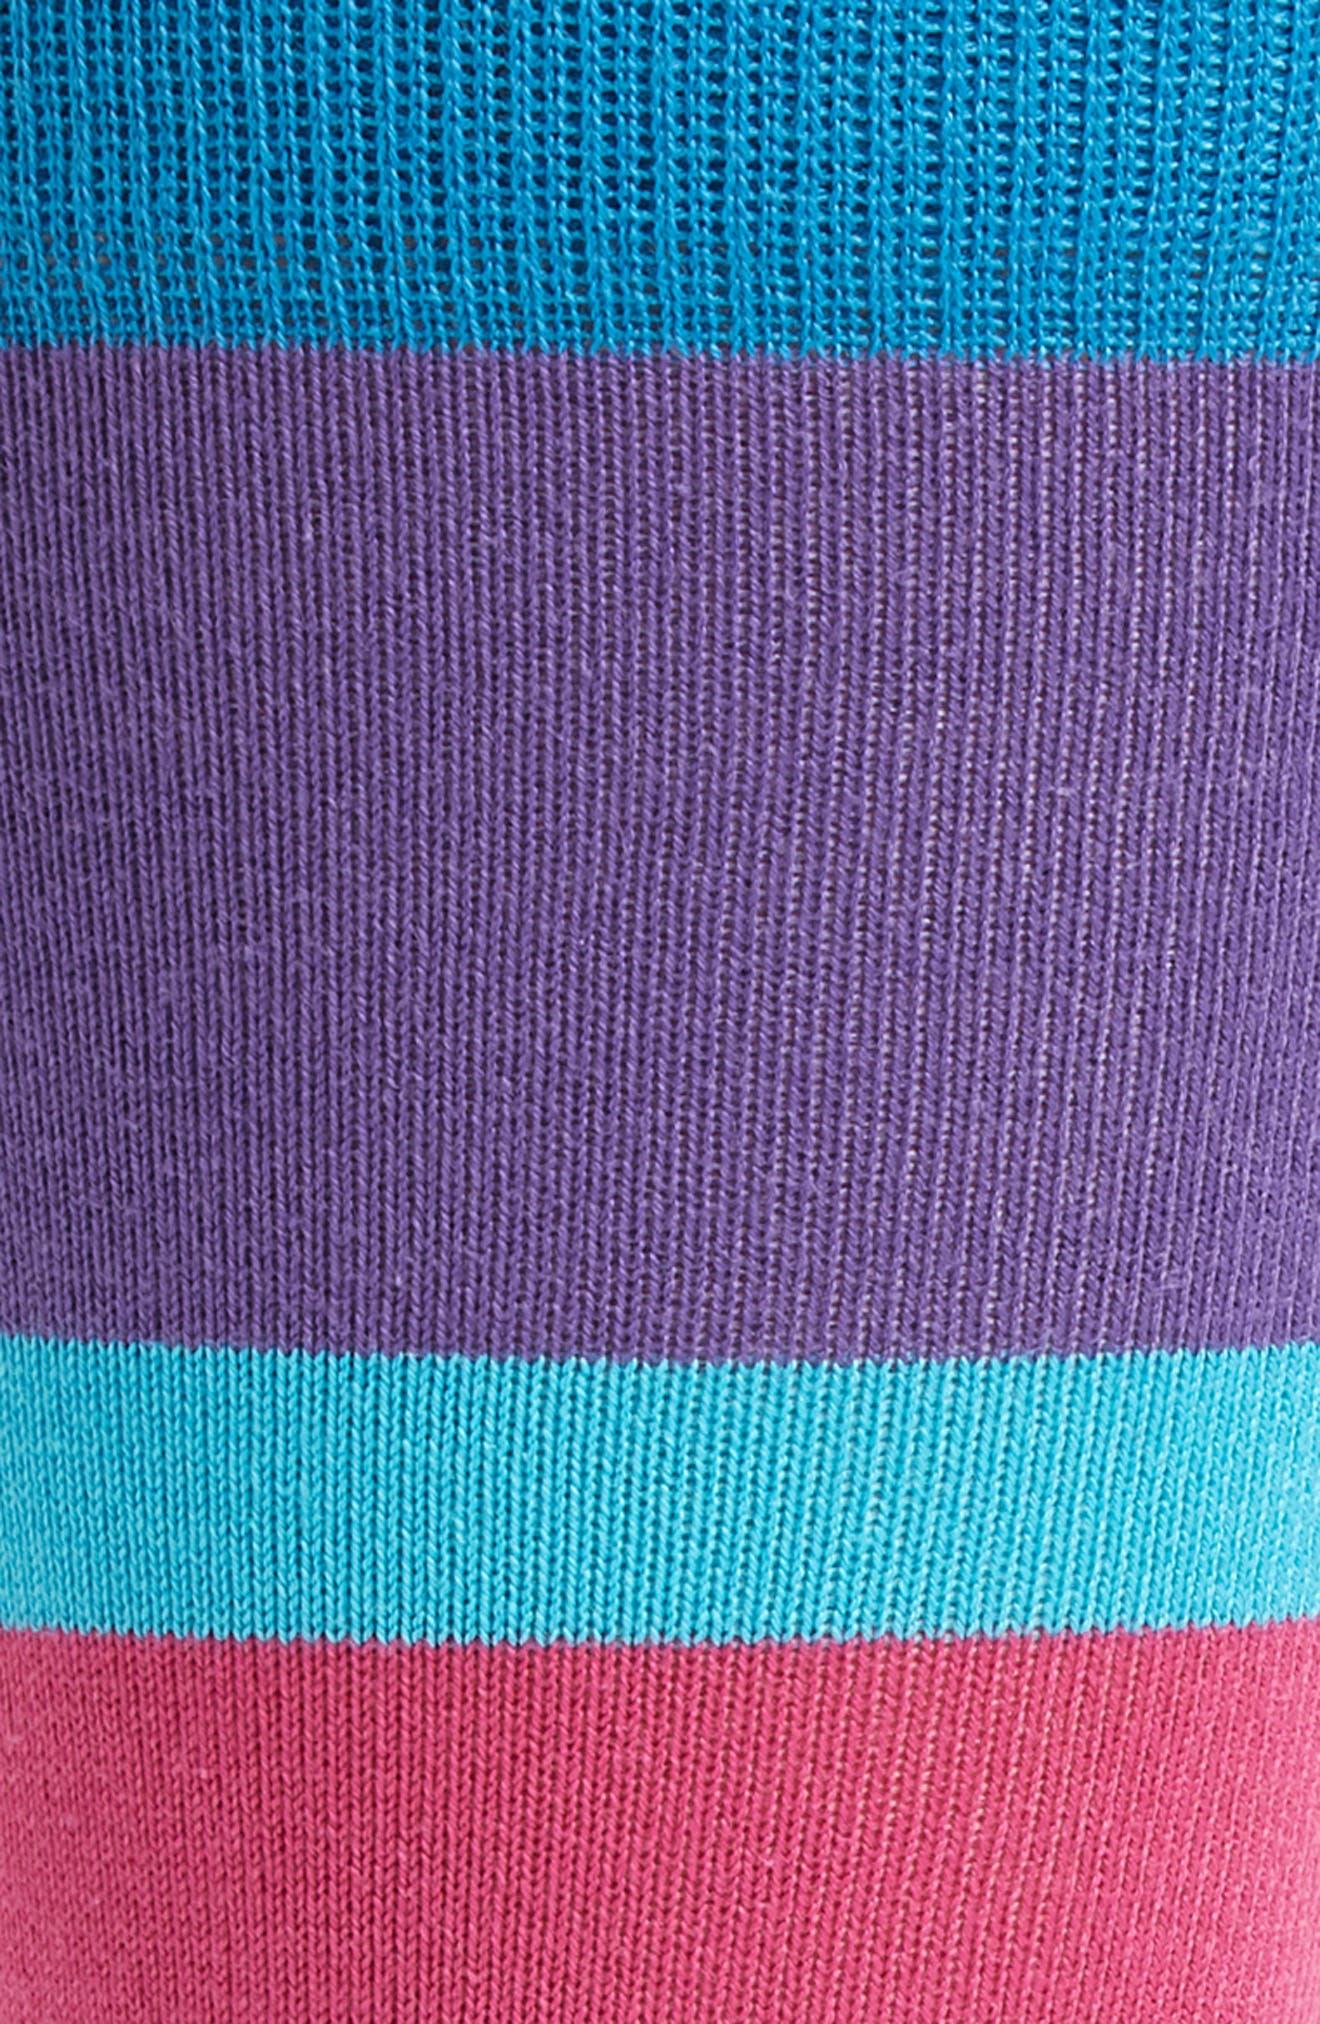 Jolly Colorblock Socks,                             Alternate thumbnail 2, color,                             Green/ Blue Multi